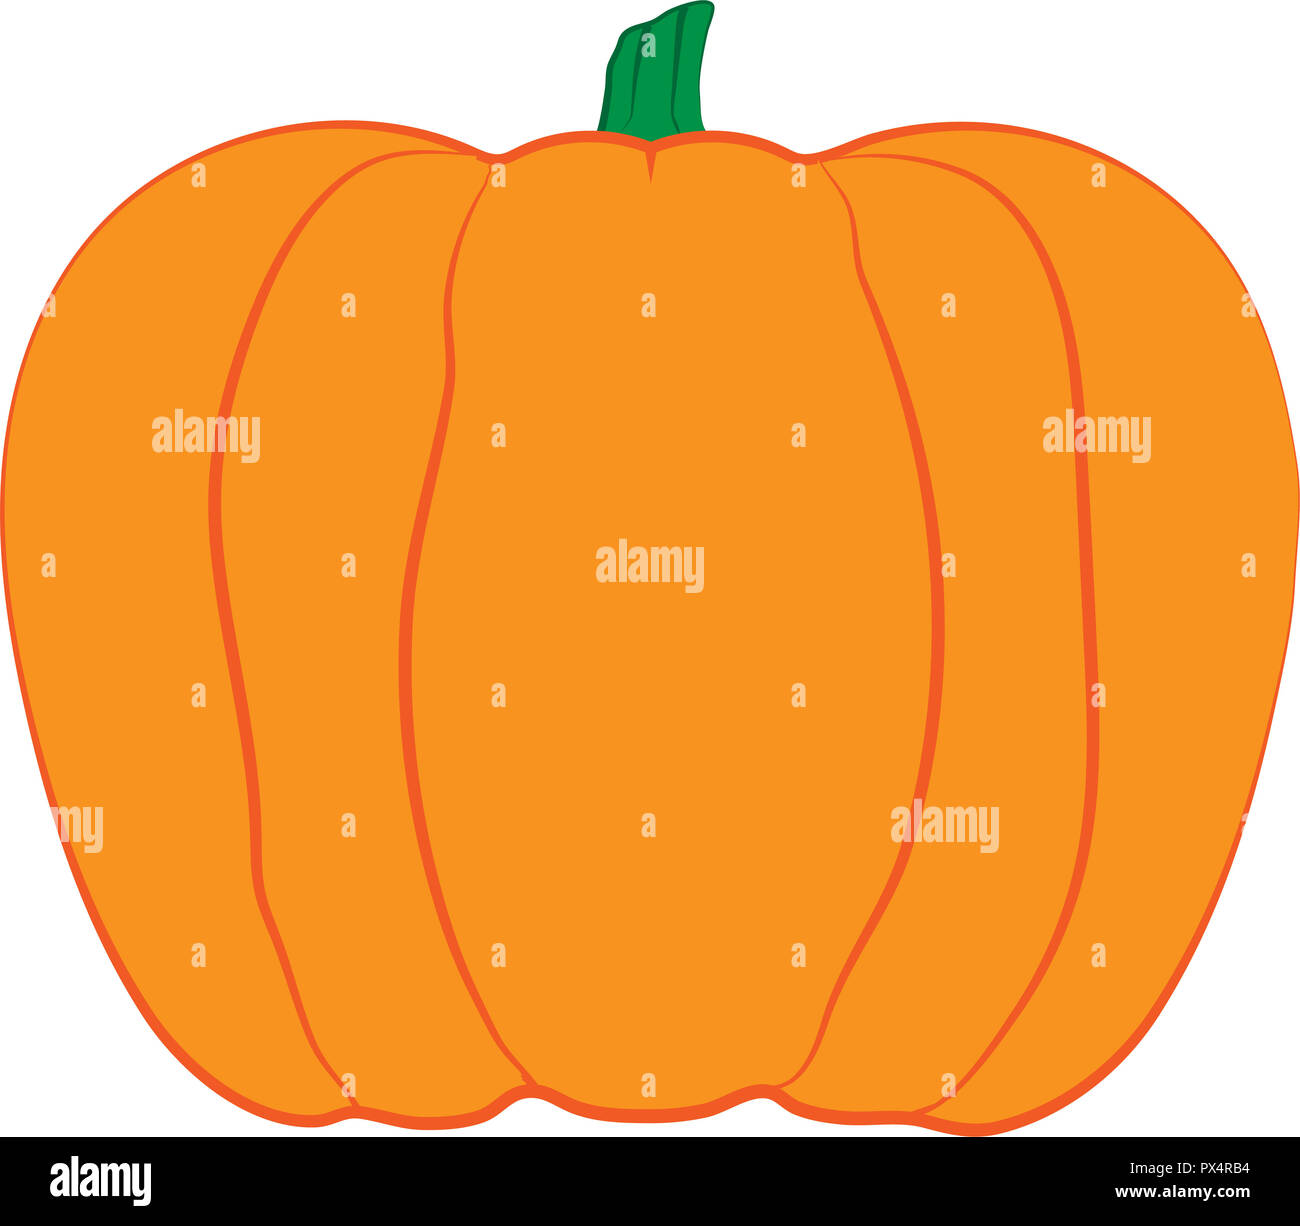 ACK-O-LANTERN Pumpkin design illustration with different stroke effects. - Stock Image